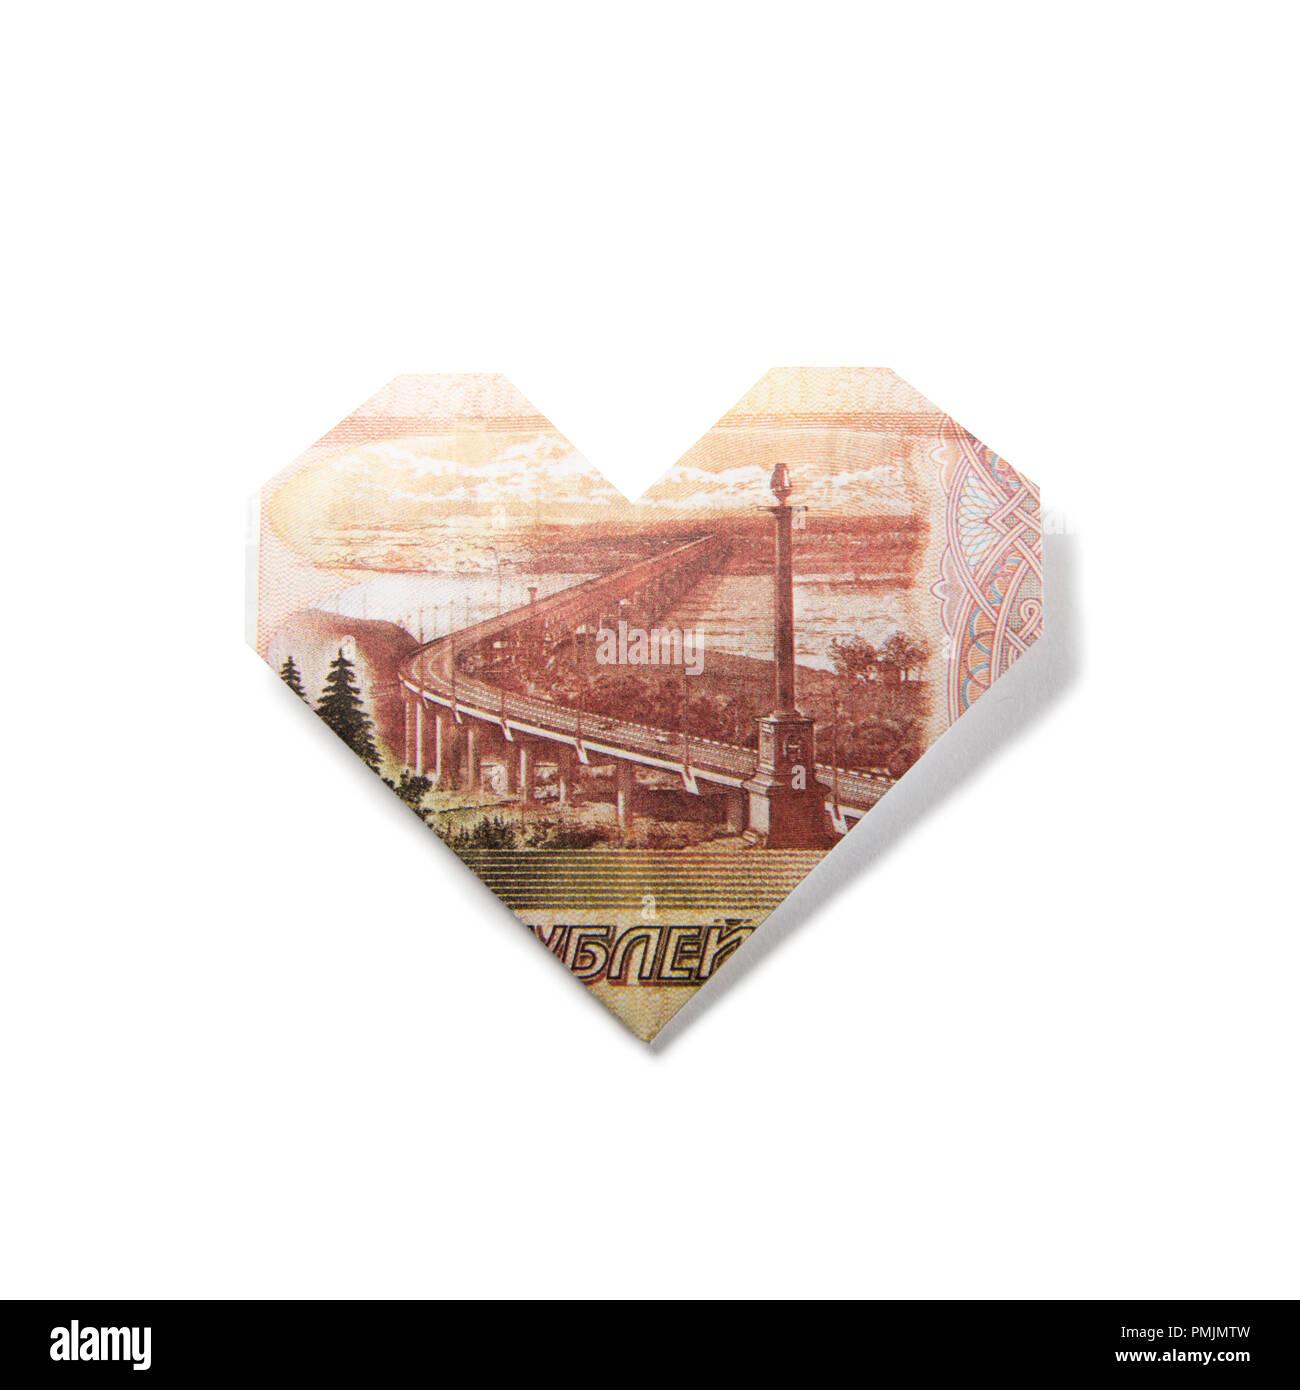 Wondrous Origami Heart Of Banknotes Stock Photo 219229049 Alamy Wiring 101 Photwellnesstrialsorg